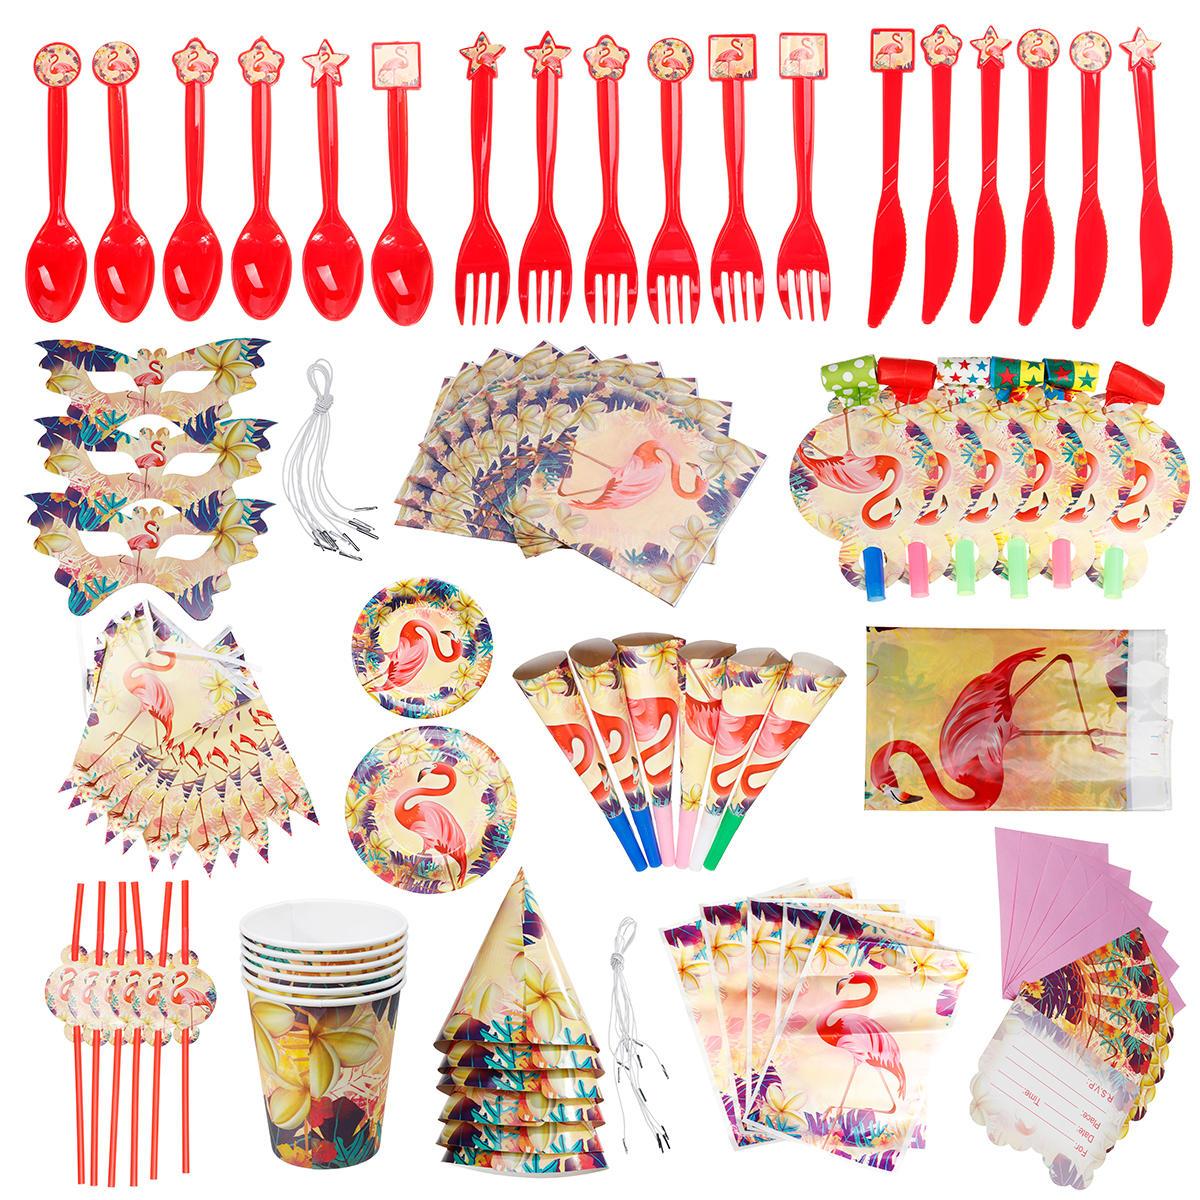 84Pcs Flamingo Kids Birthday Party Tableware Set Decor Plates Mask Paper Box Cup Decoration Toys